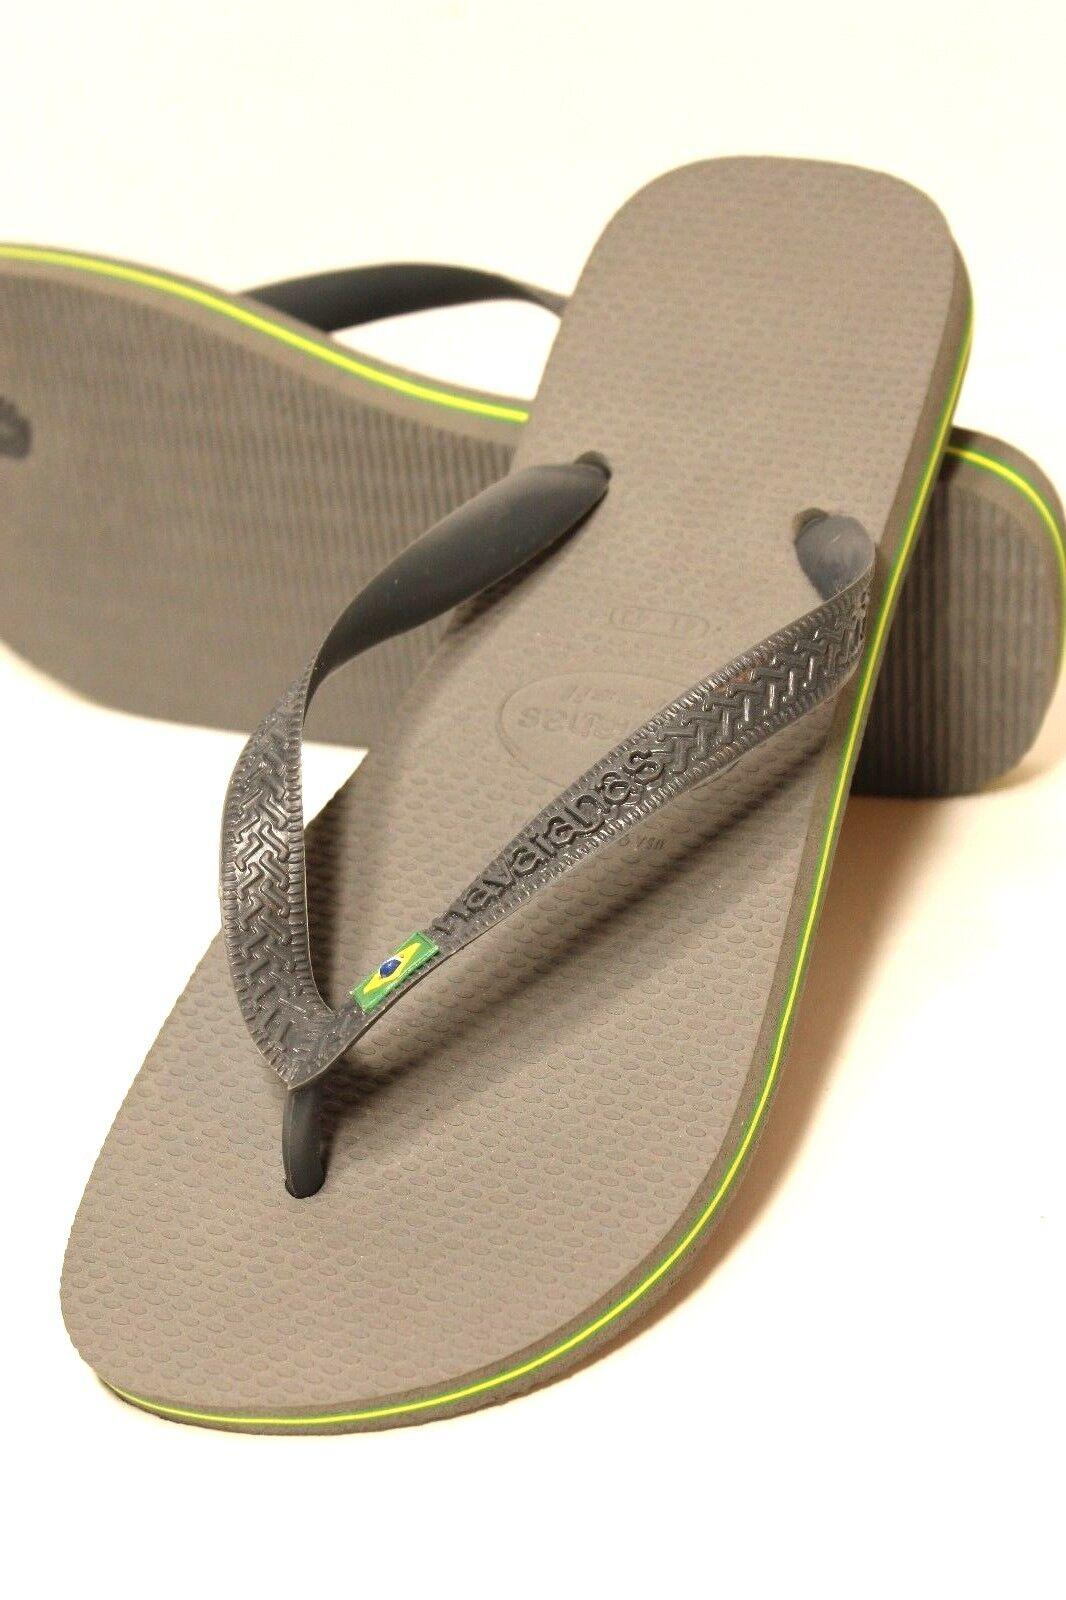 46ddd663e4b7ea HAVAIANAS Mens Size 9 US   43 43 43 EUR Brazil Sandal Steel Gray Flip Flop  Sandal 78bc88